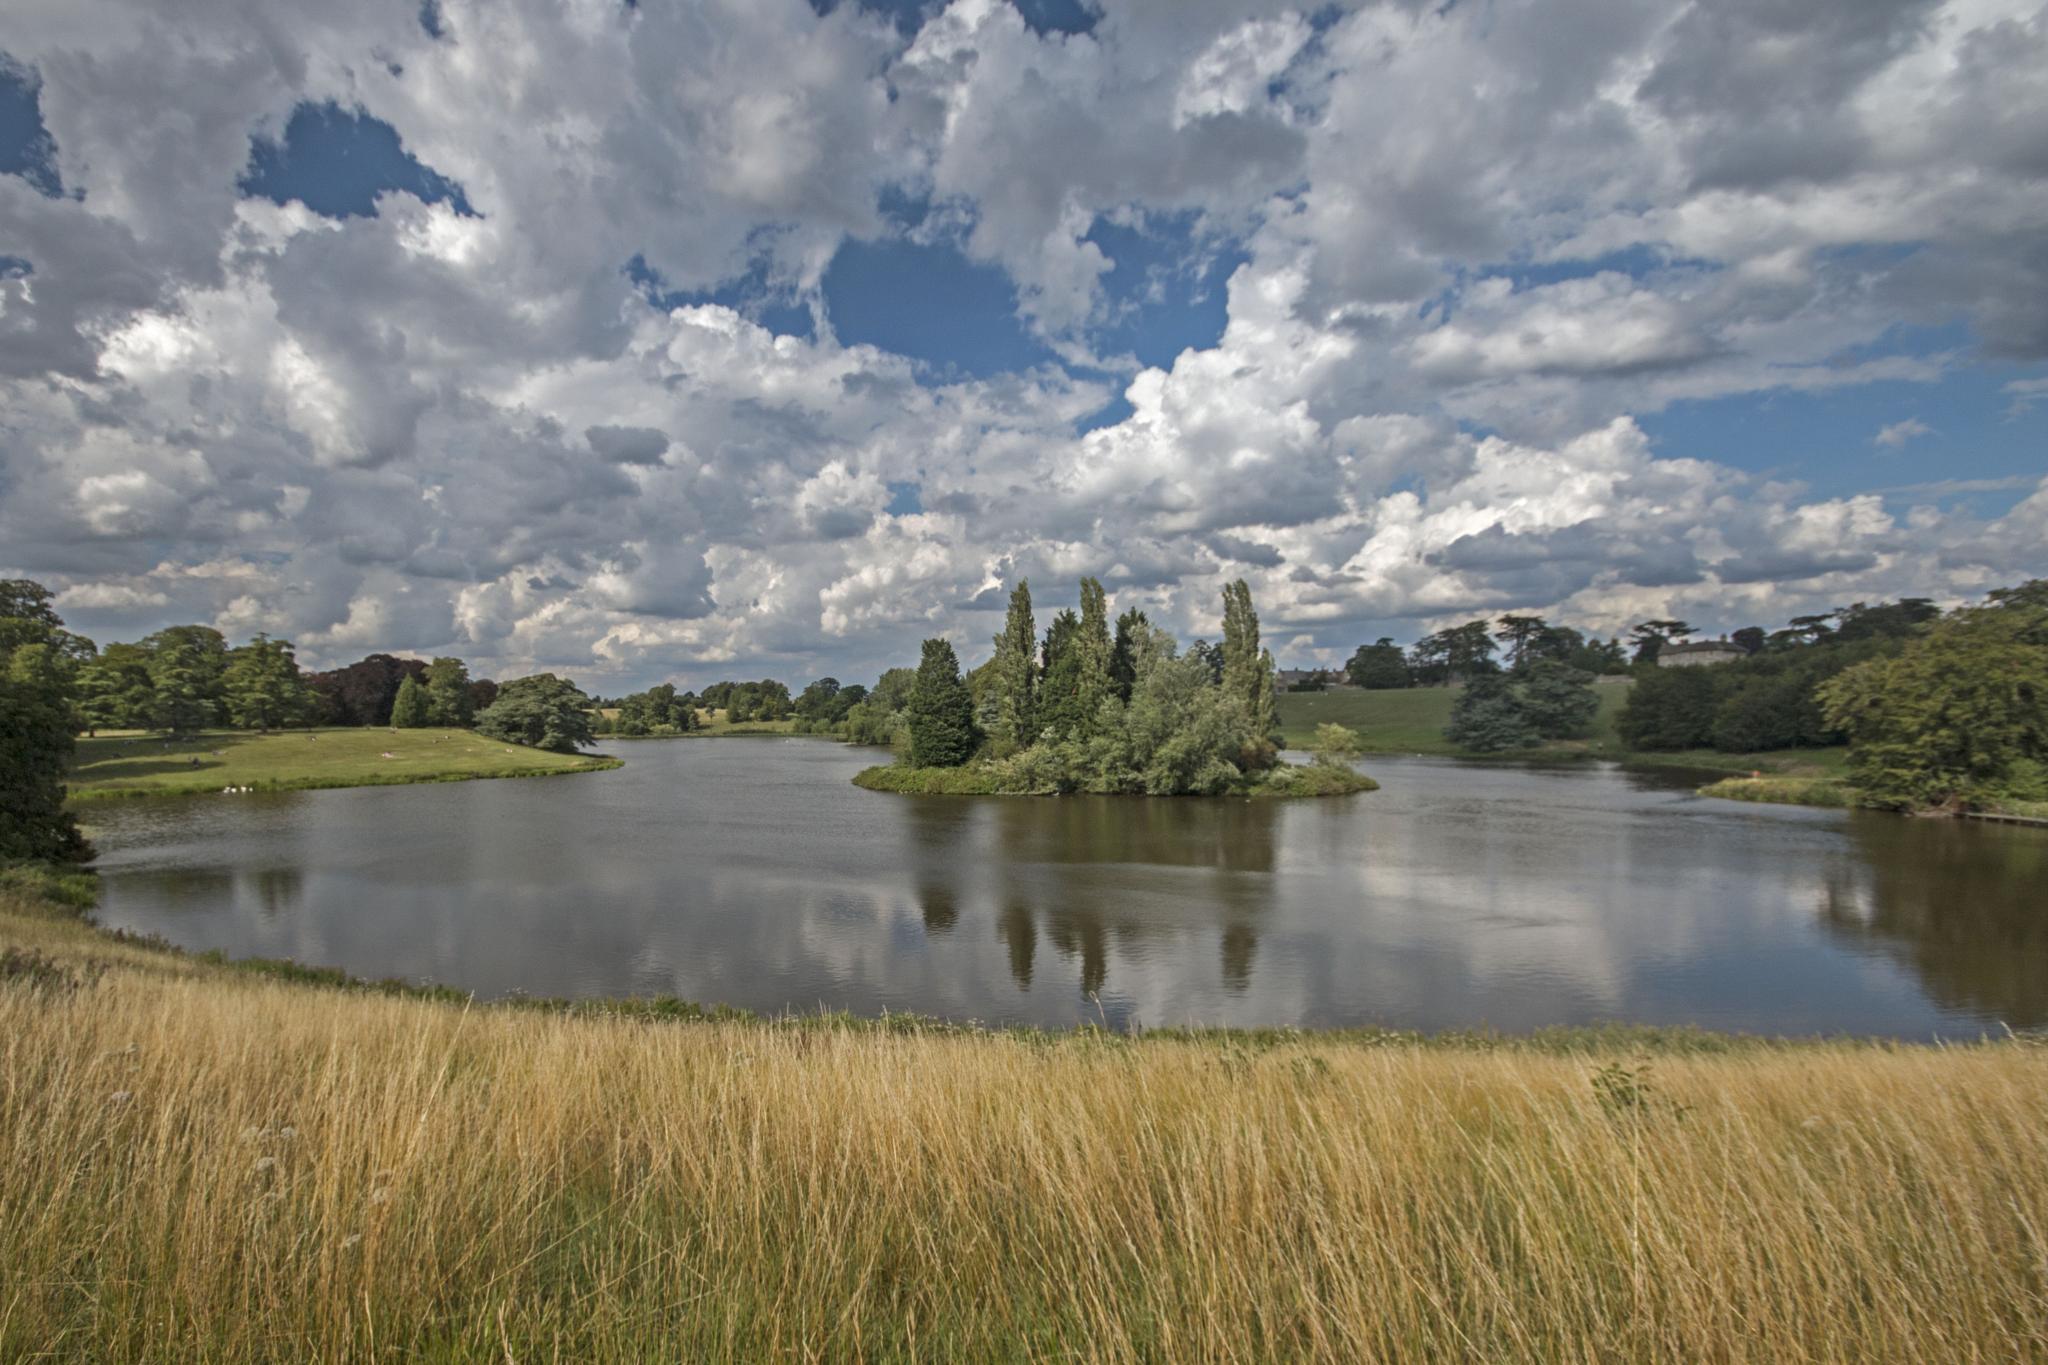 The lake at Blenheim by john.cavana